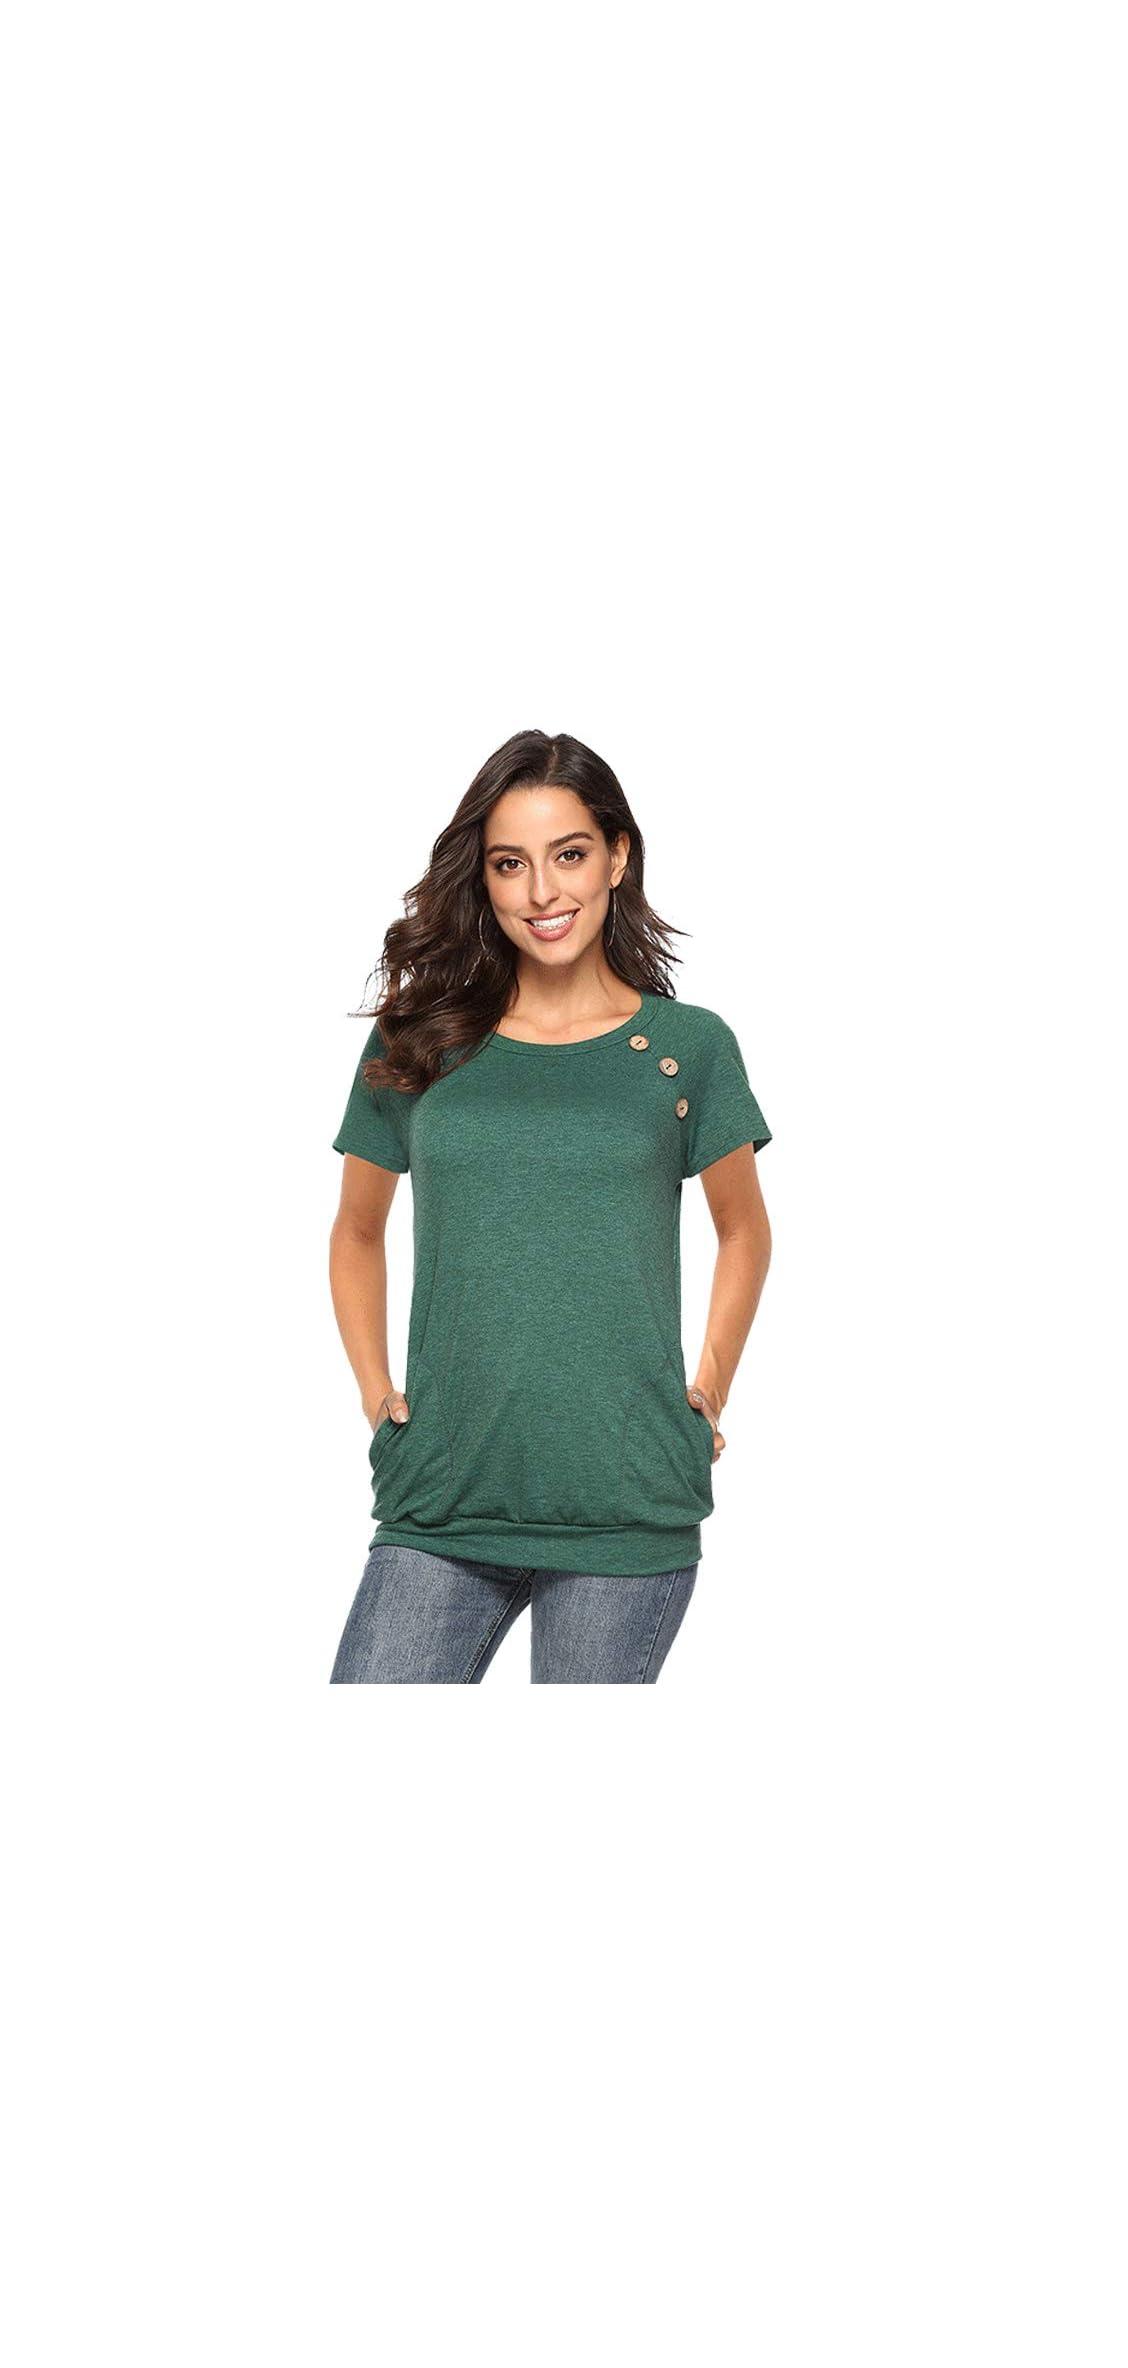 Women Crew Neck Plain T-shirt Short Sleeve Cotton Loose